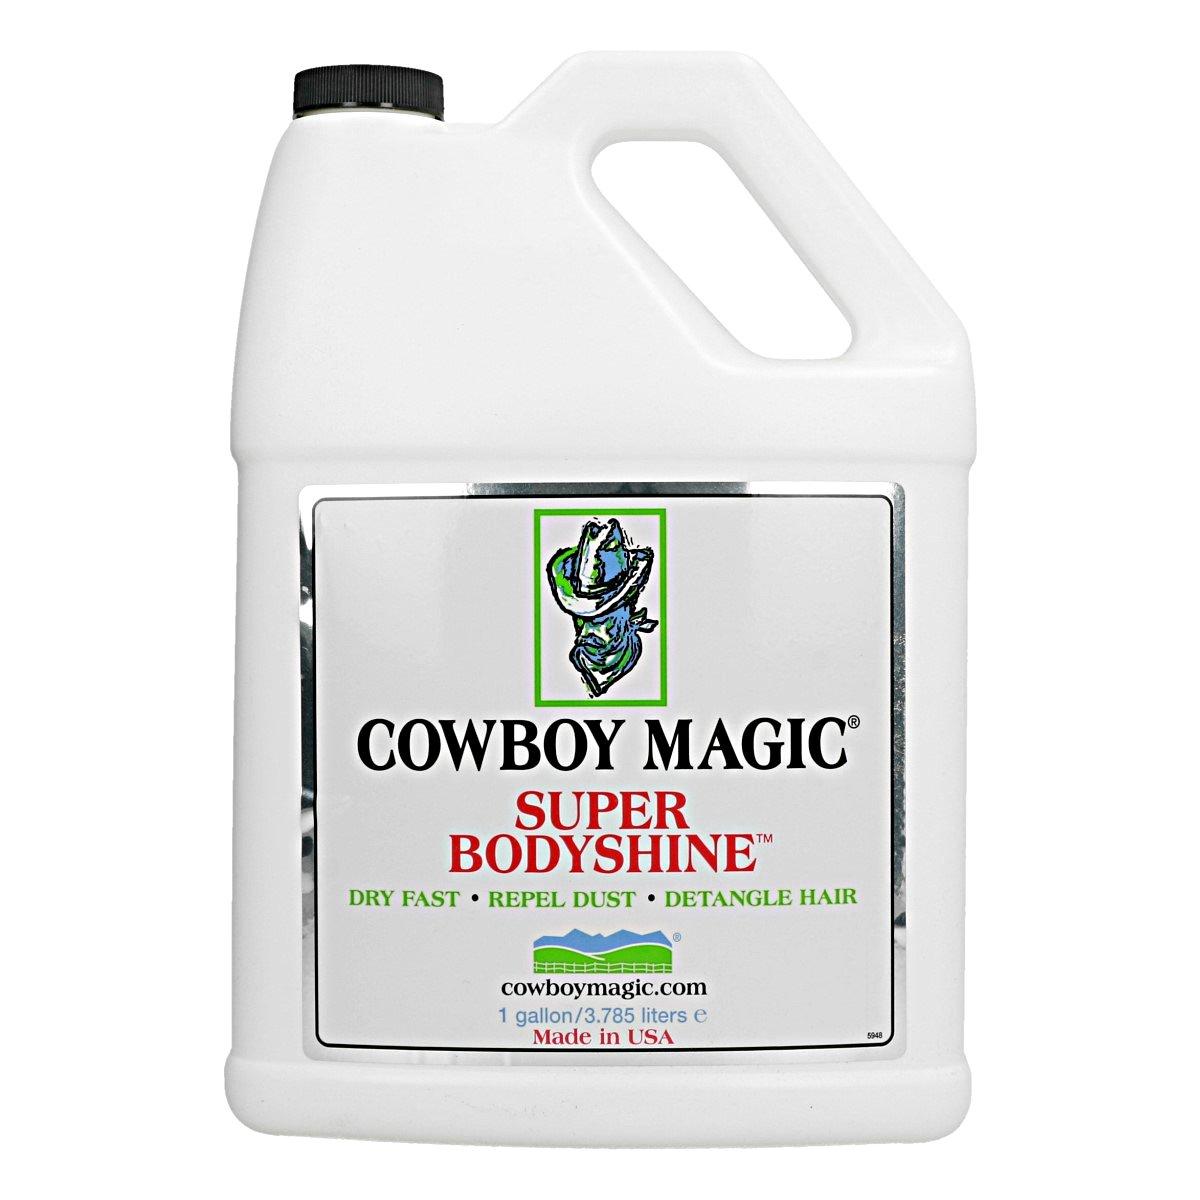 Afbeelding van Cowboy Magic Super Bodyshine 3785ml